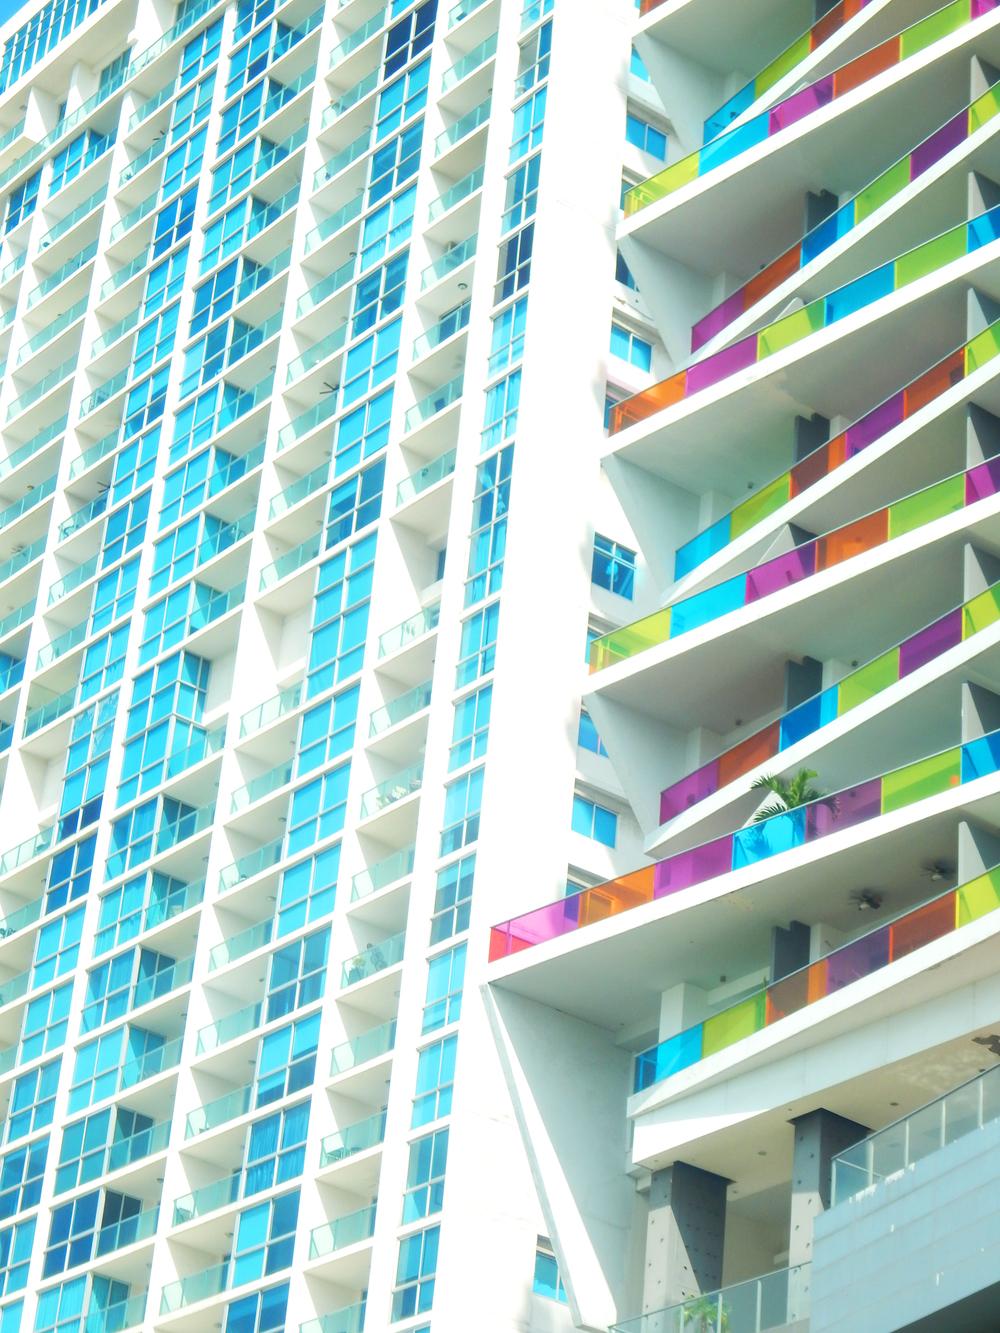 Ventanas de colores